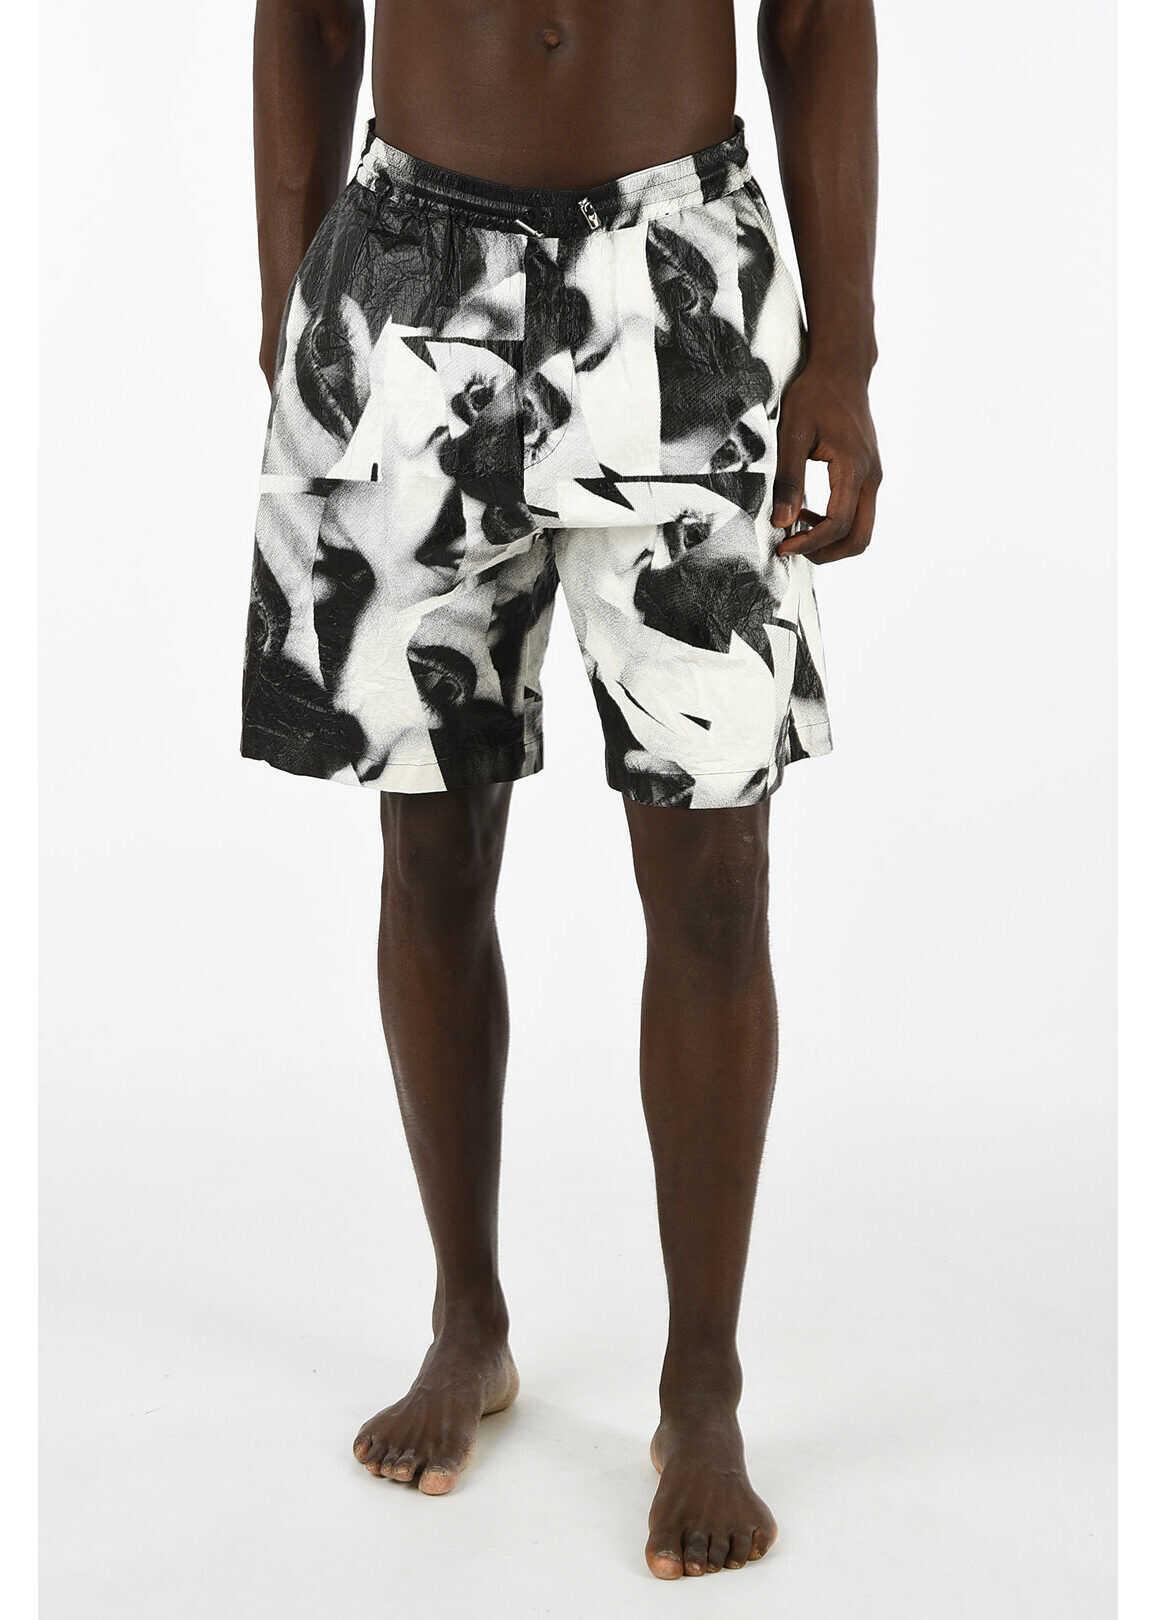 DSQUARED2 MERT & MARCUS 1994 Printed Short Beachwear BLACK & WHITE